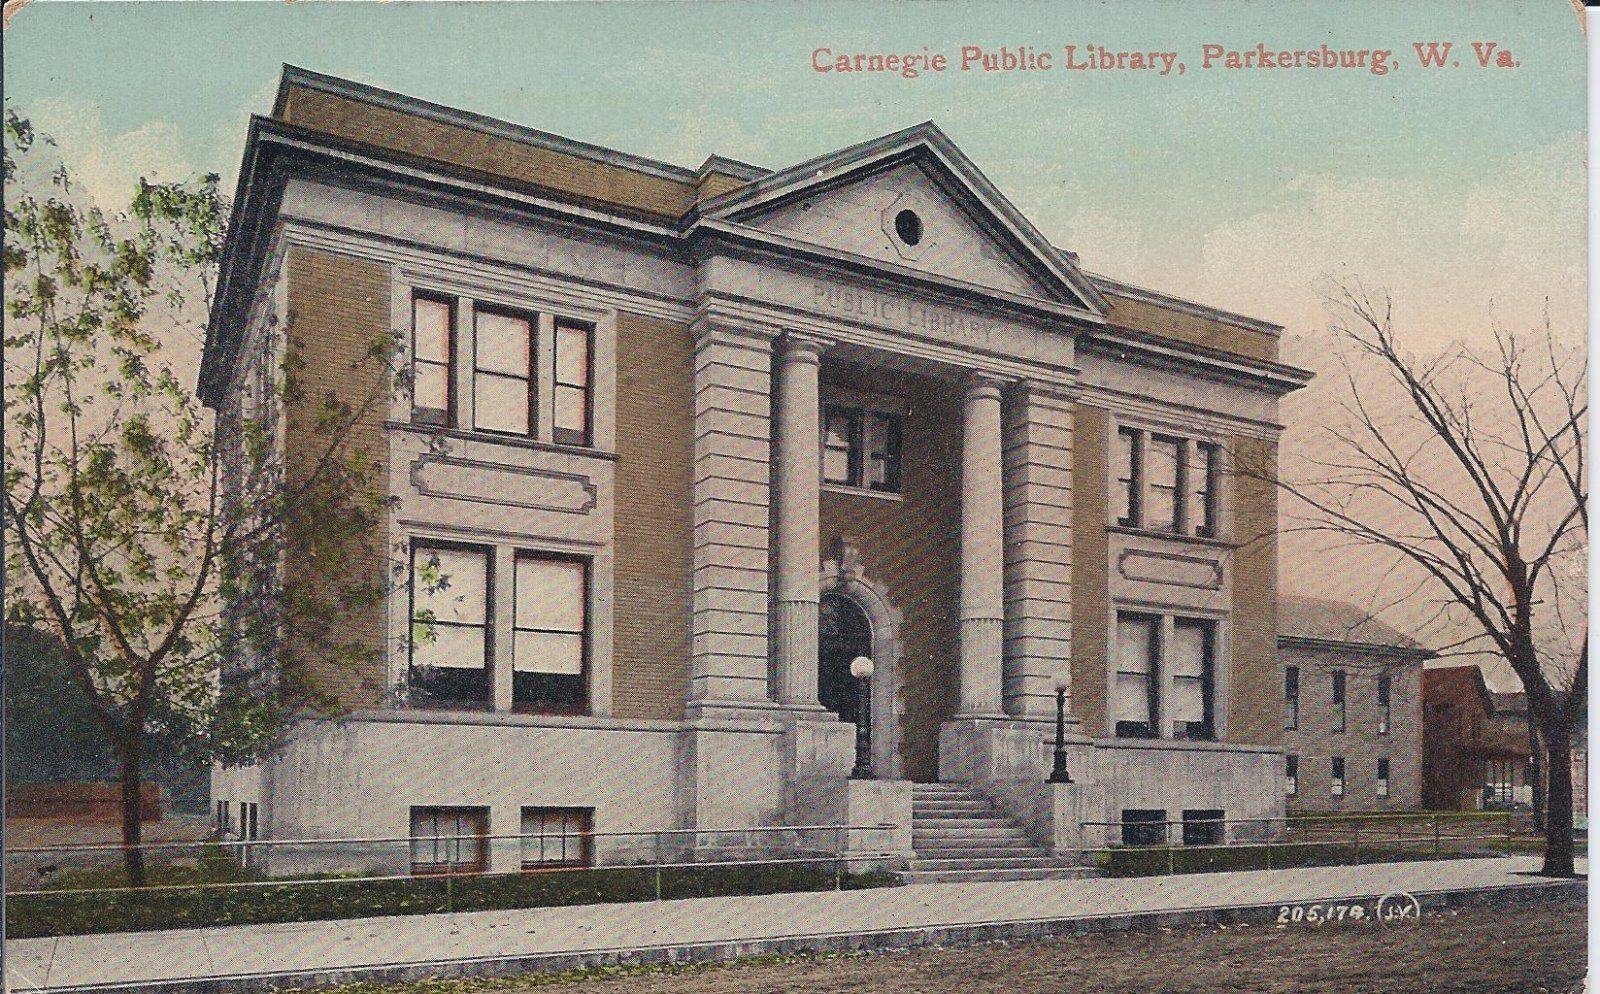 Postcard Exterior Carnegie Public Library Parkersburg Wv Parkersburg Parkersburg Wv West Virginia